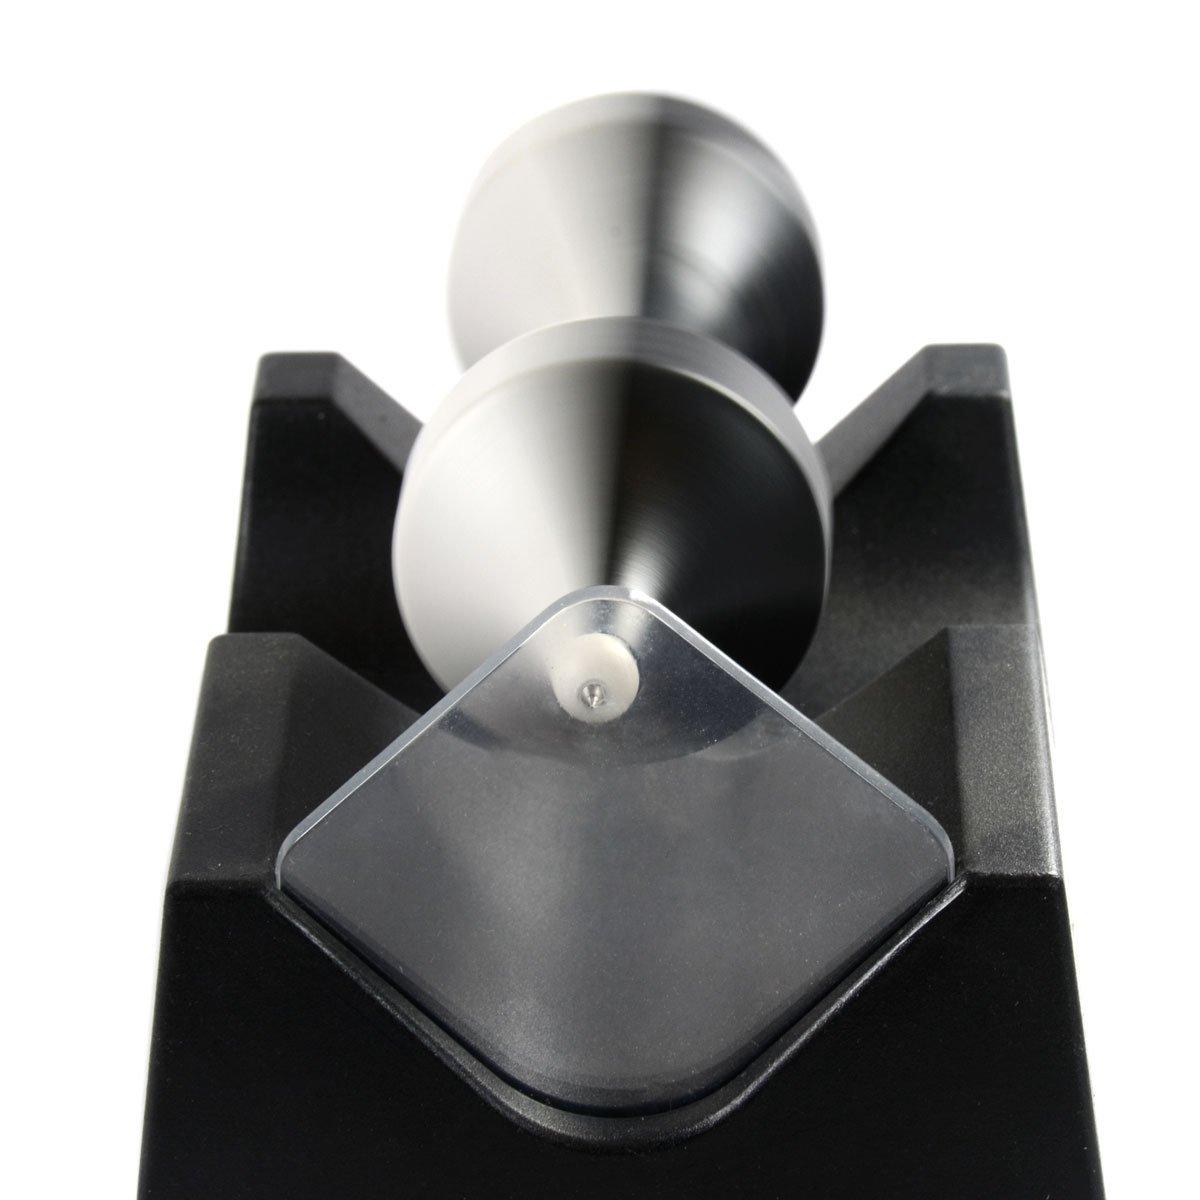 CMS MAGNETICS Magnetic Levitating Desk Toy - Levitation Magnet Demonstrator (2 Pieces) by CMS MAGNETICS (Image #2)